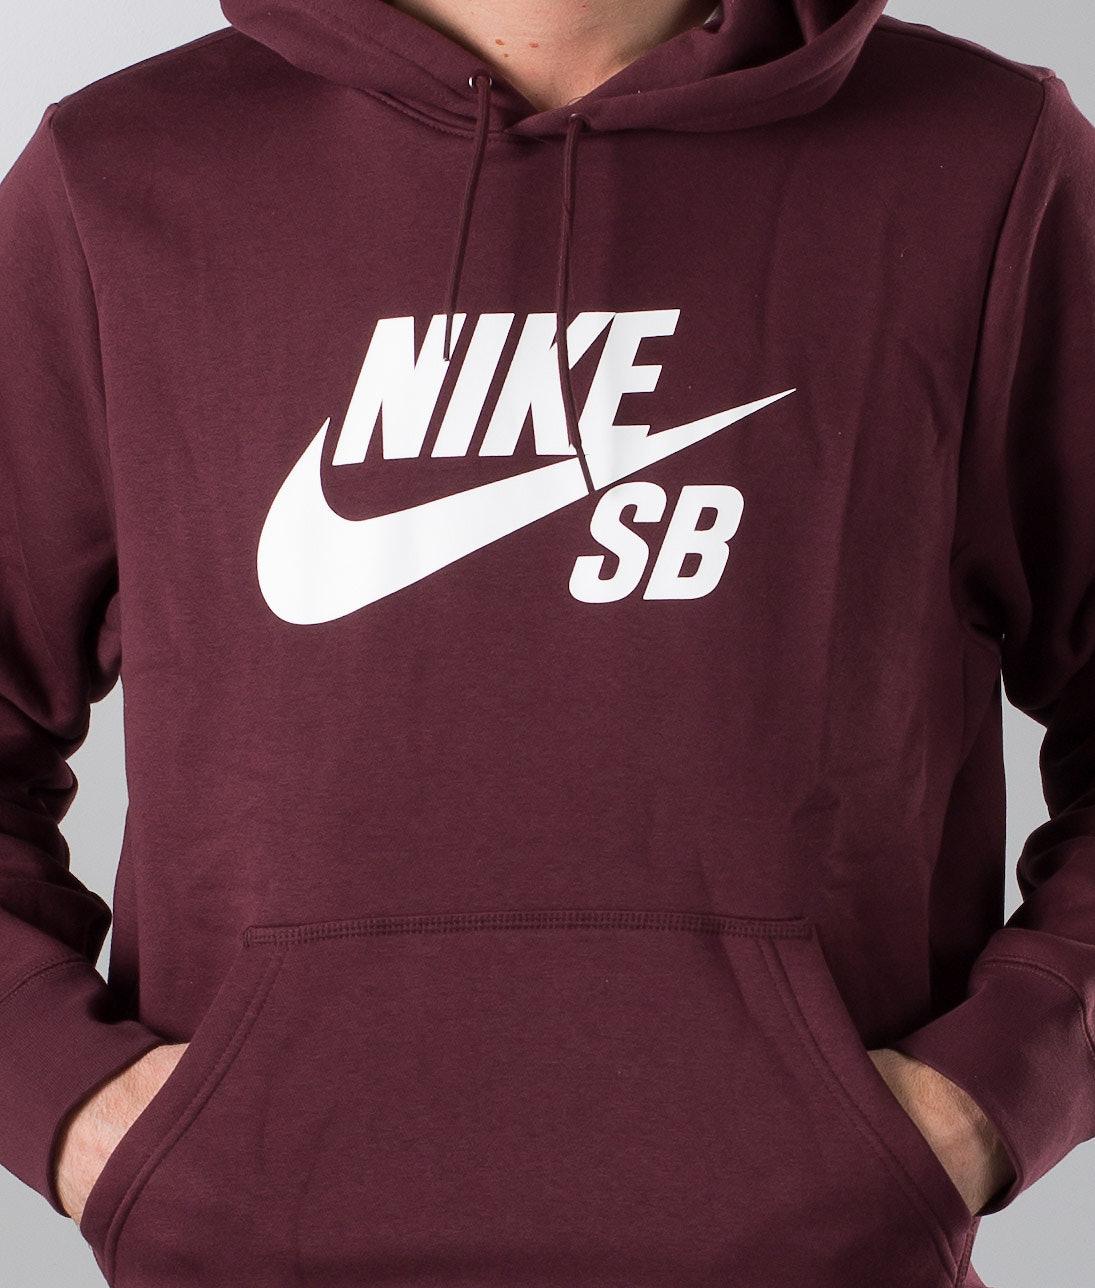 9f292fde39 Nike Sb Icon Hood Burgundy Crush White - Ridestore.com